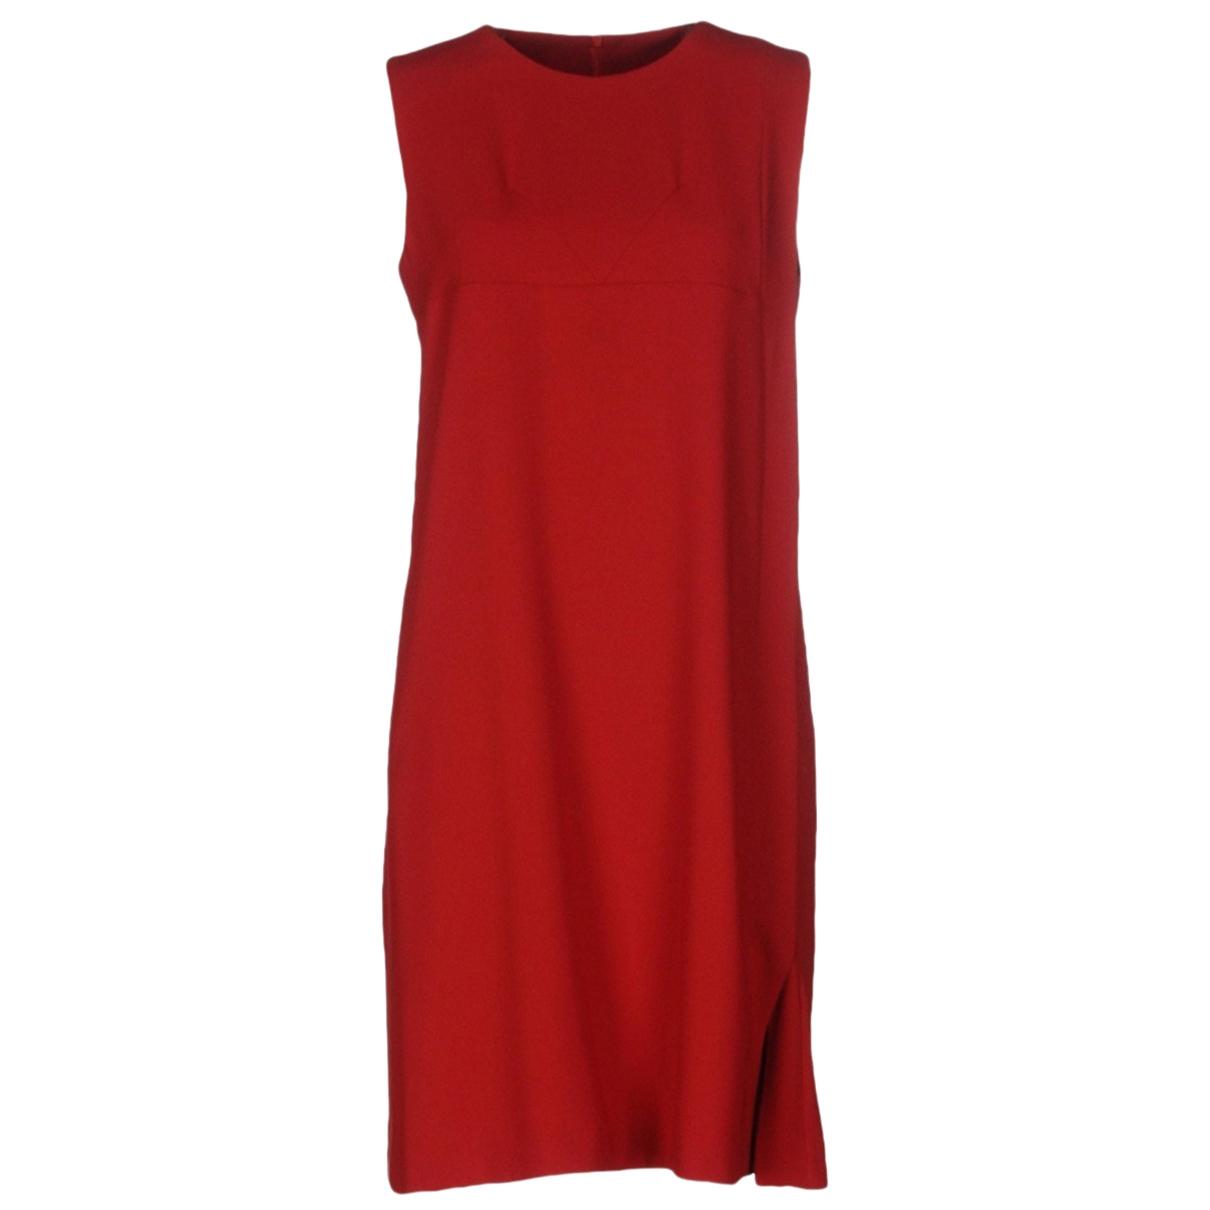 Cacharel \N Red dress for Women 38 FR